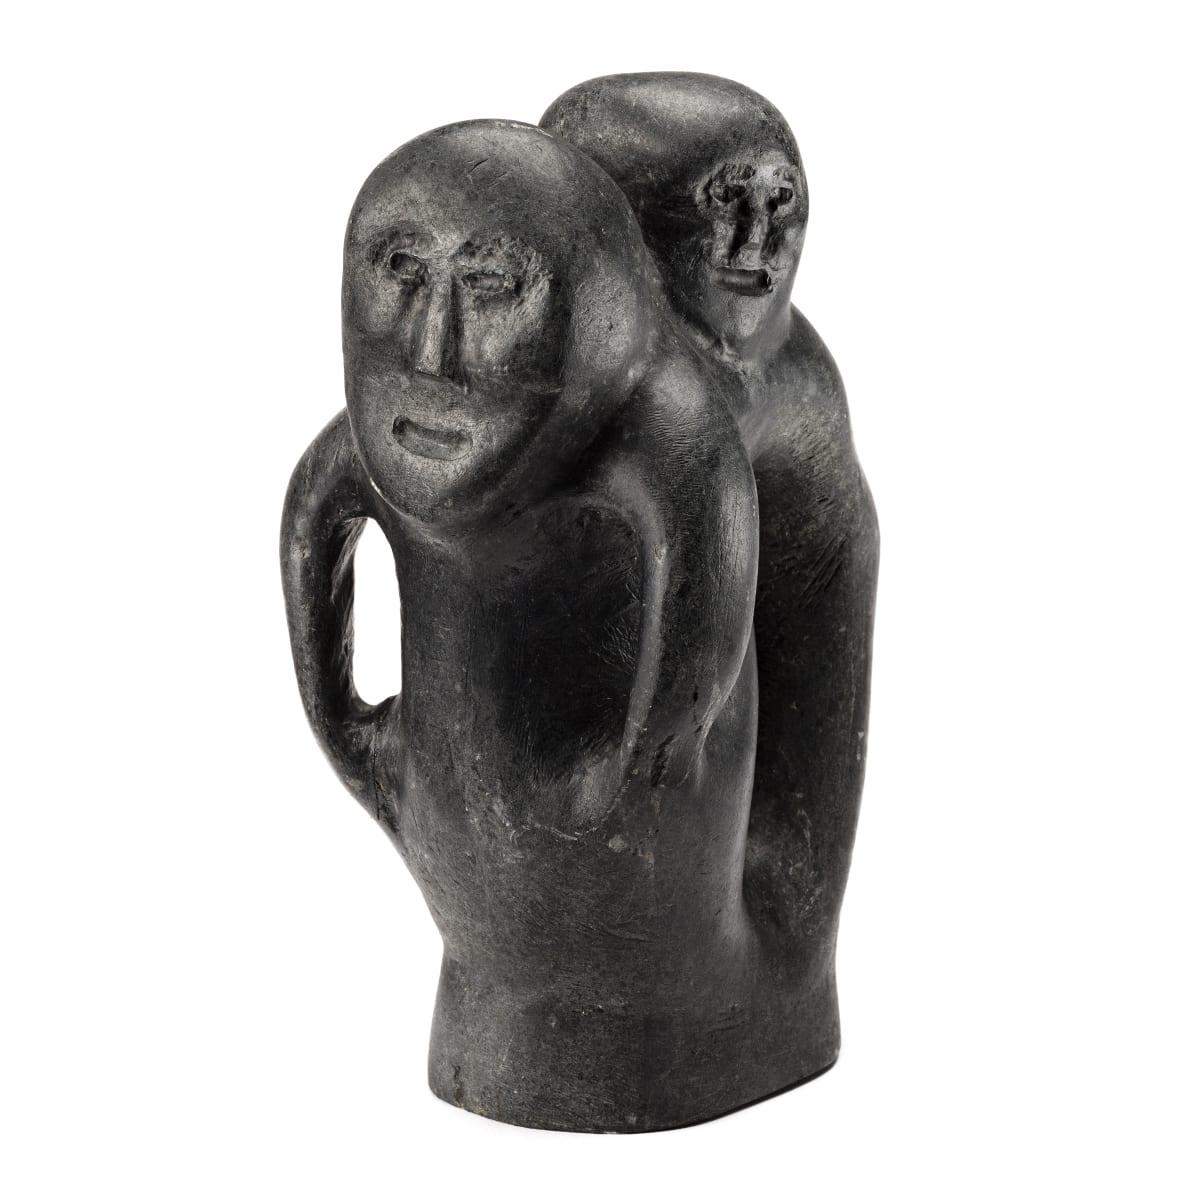 JOHN TIKTAK, R.C.A. (1916-1981) KANGIQLINIQ (RANKIN INLET) Two Figures, c. 1968 REALIZED: $36,000